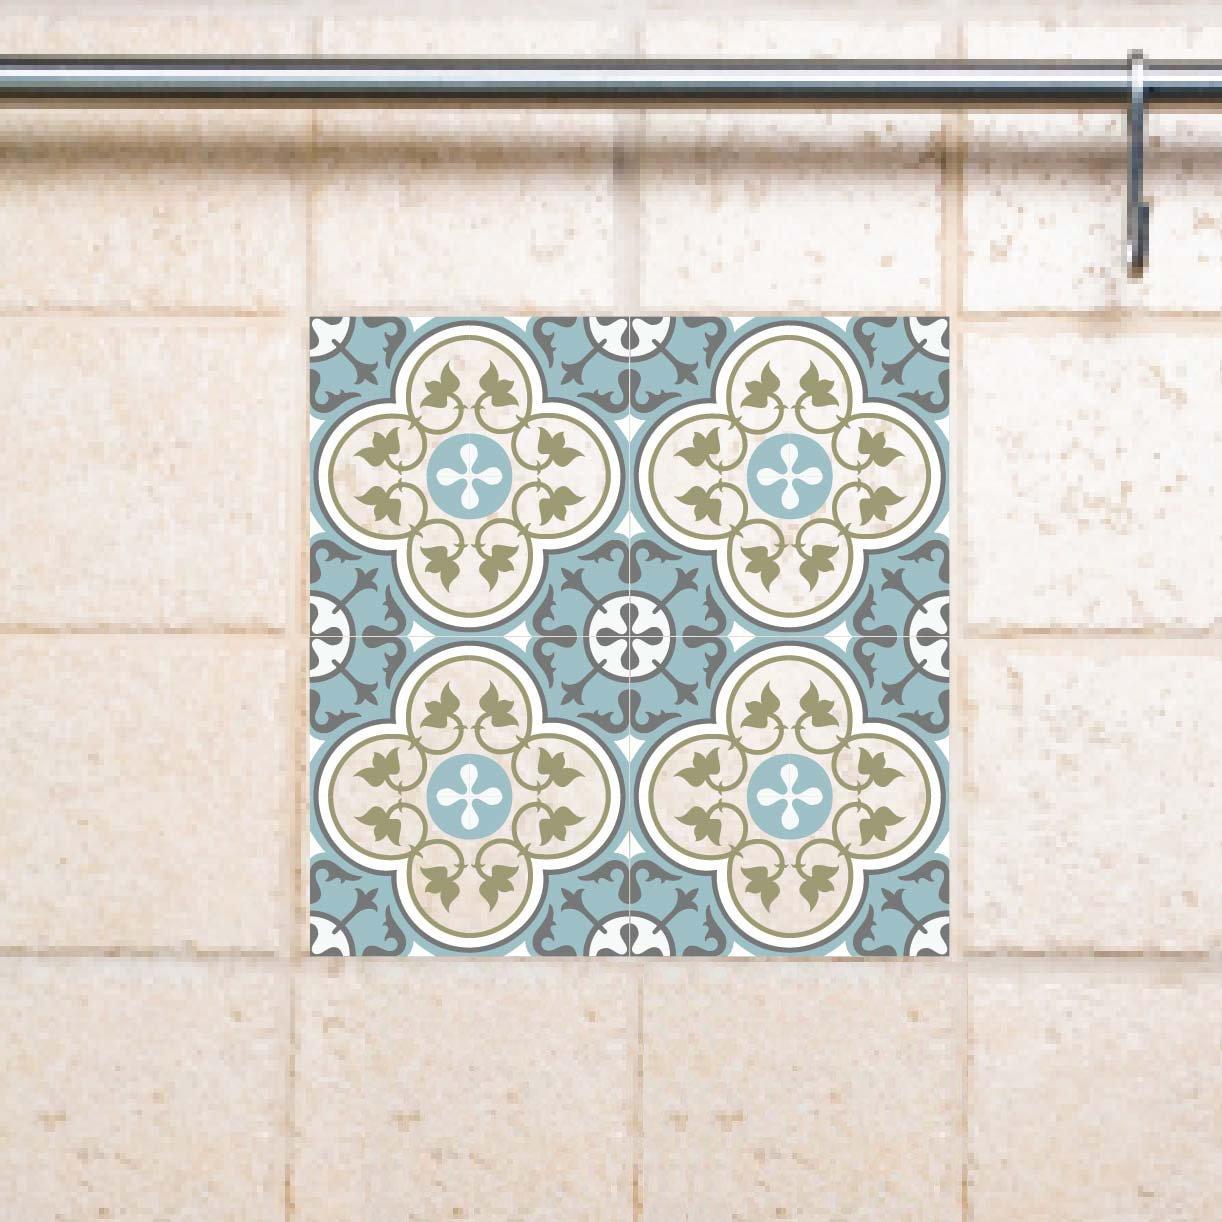 Tile Decals Kitchen Bathroom Tiles Vinyl Wall Floor Tiles Kitchen Decoratiom Free Shipping 178 Vanill Co